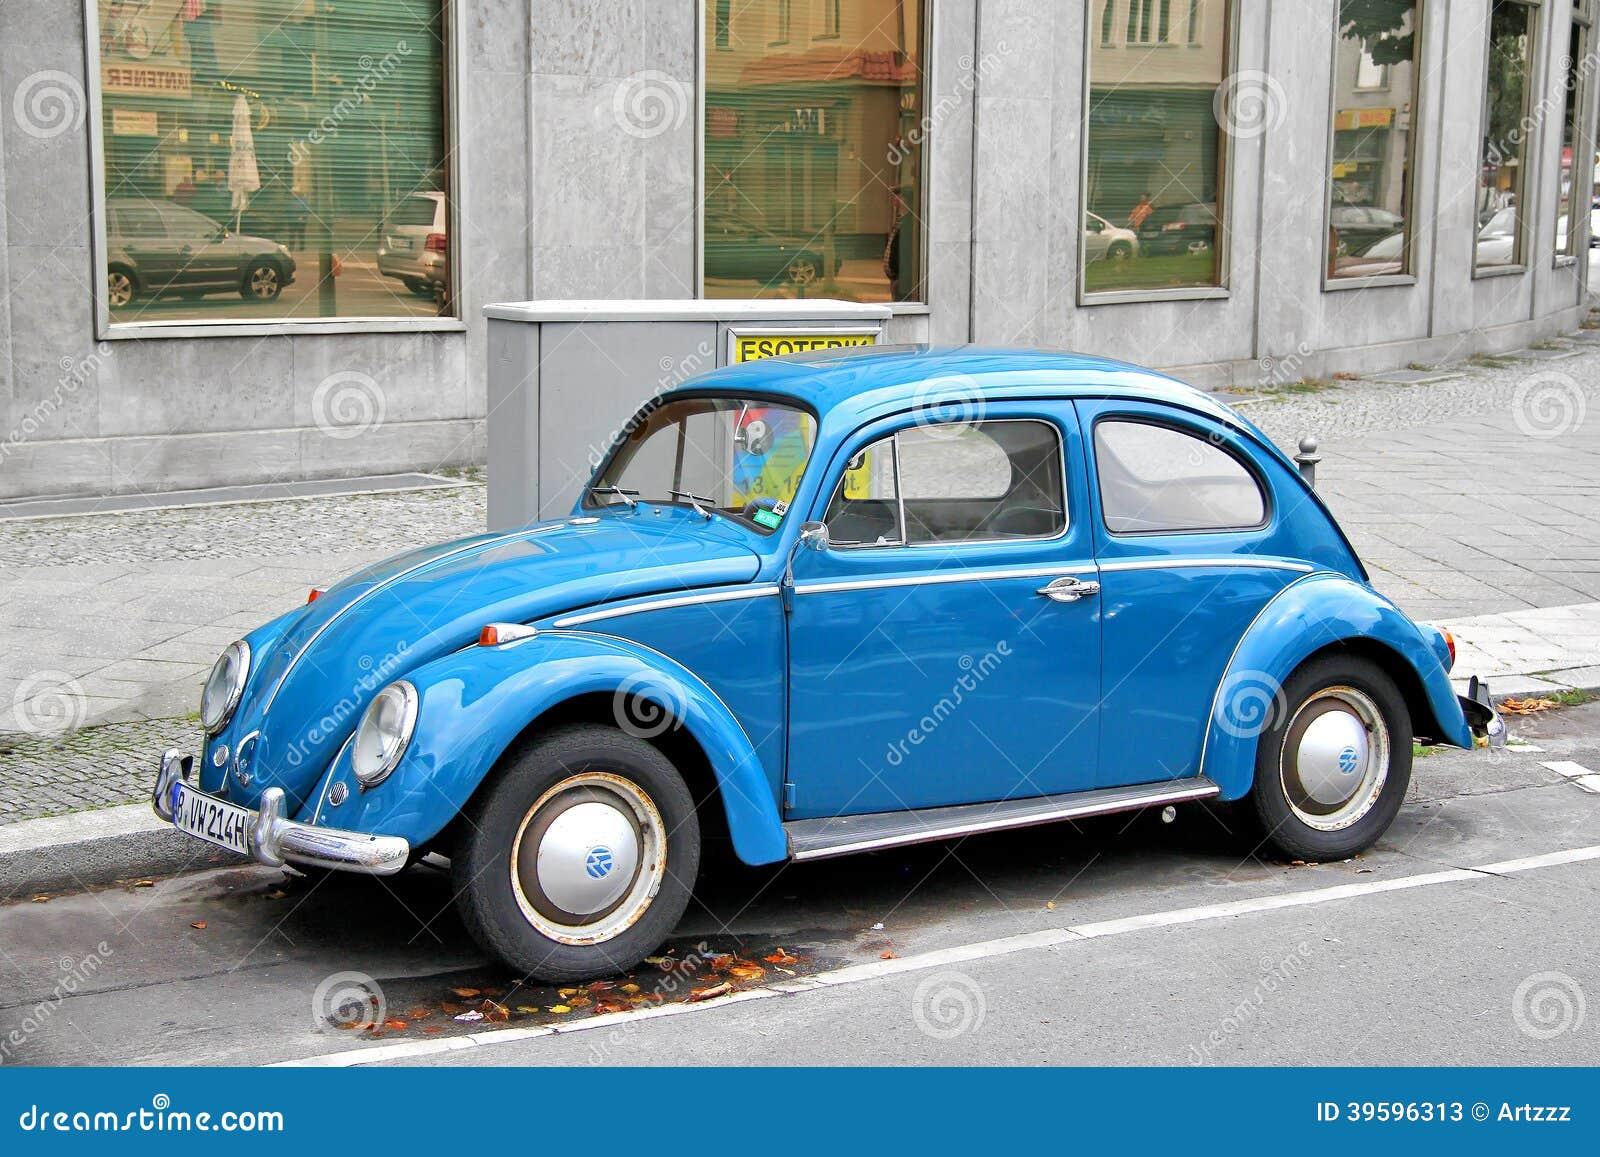 volkswagen beetle editorial stock photo image 39596313. Black Bedroom Furniture Sets. Home Design Ideas